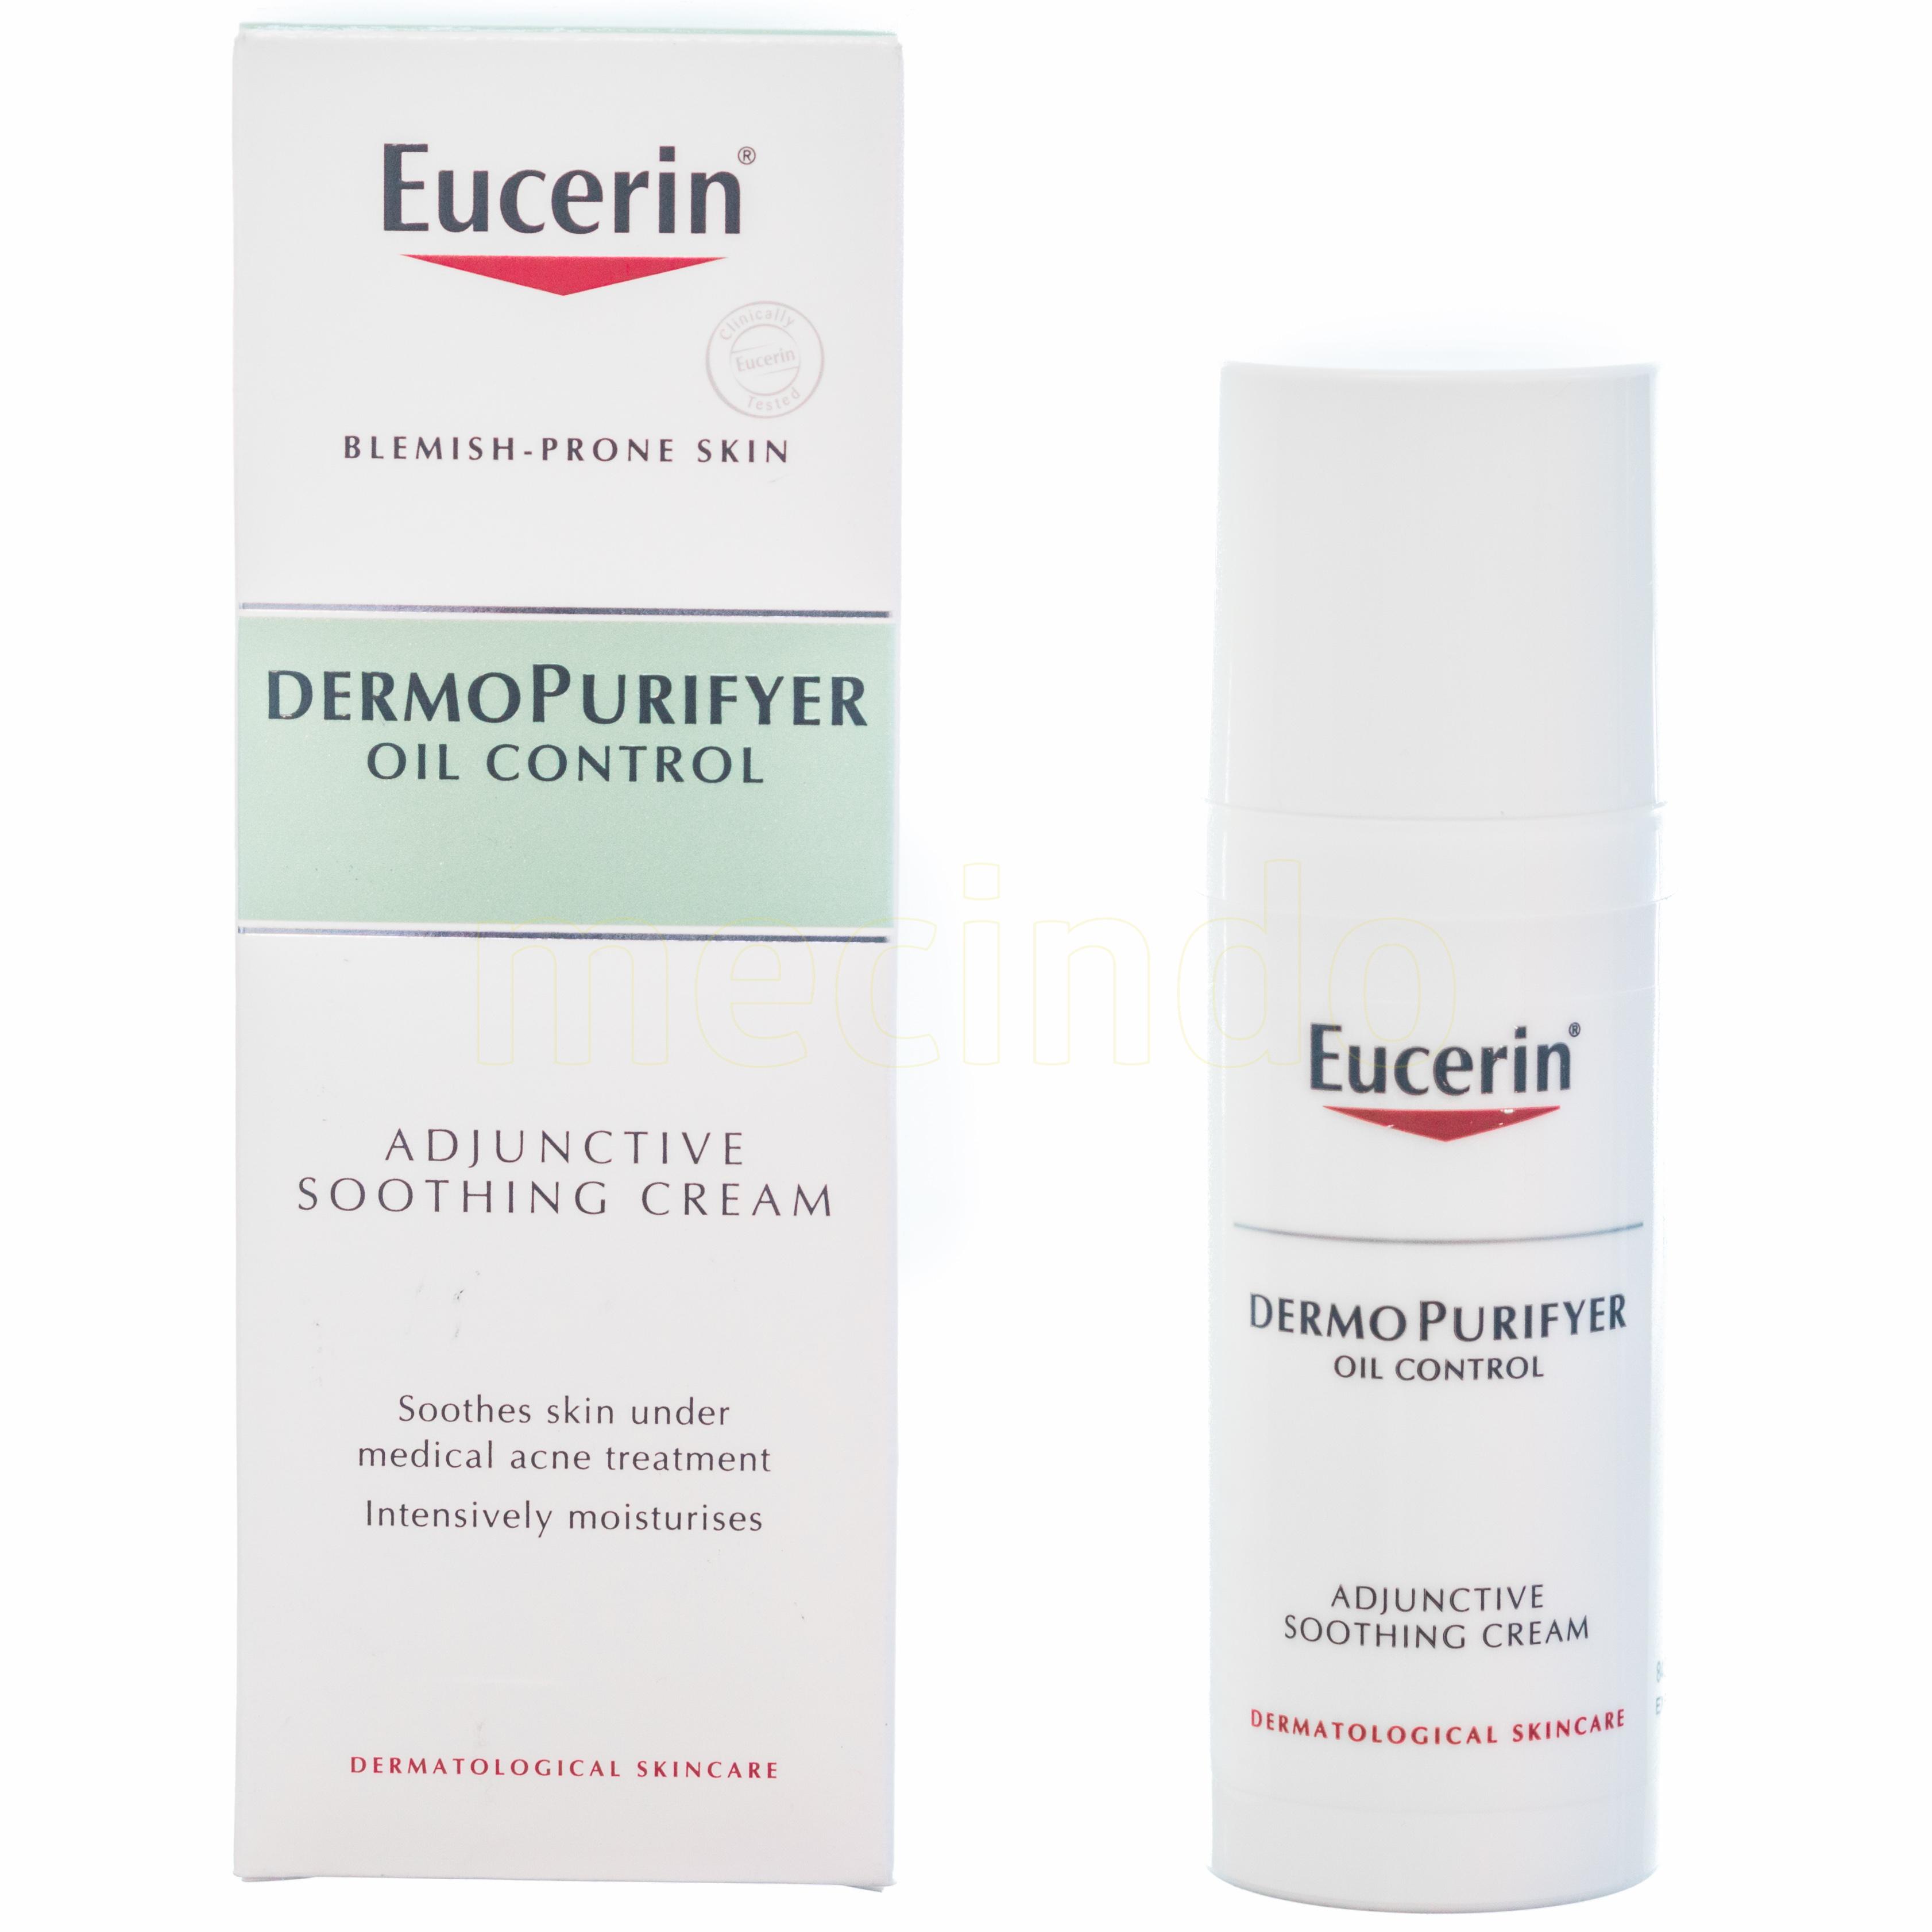 Eucerin DermoPurifyer Oil Control Soothing Cream – 50 ml